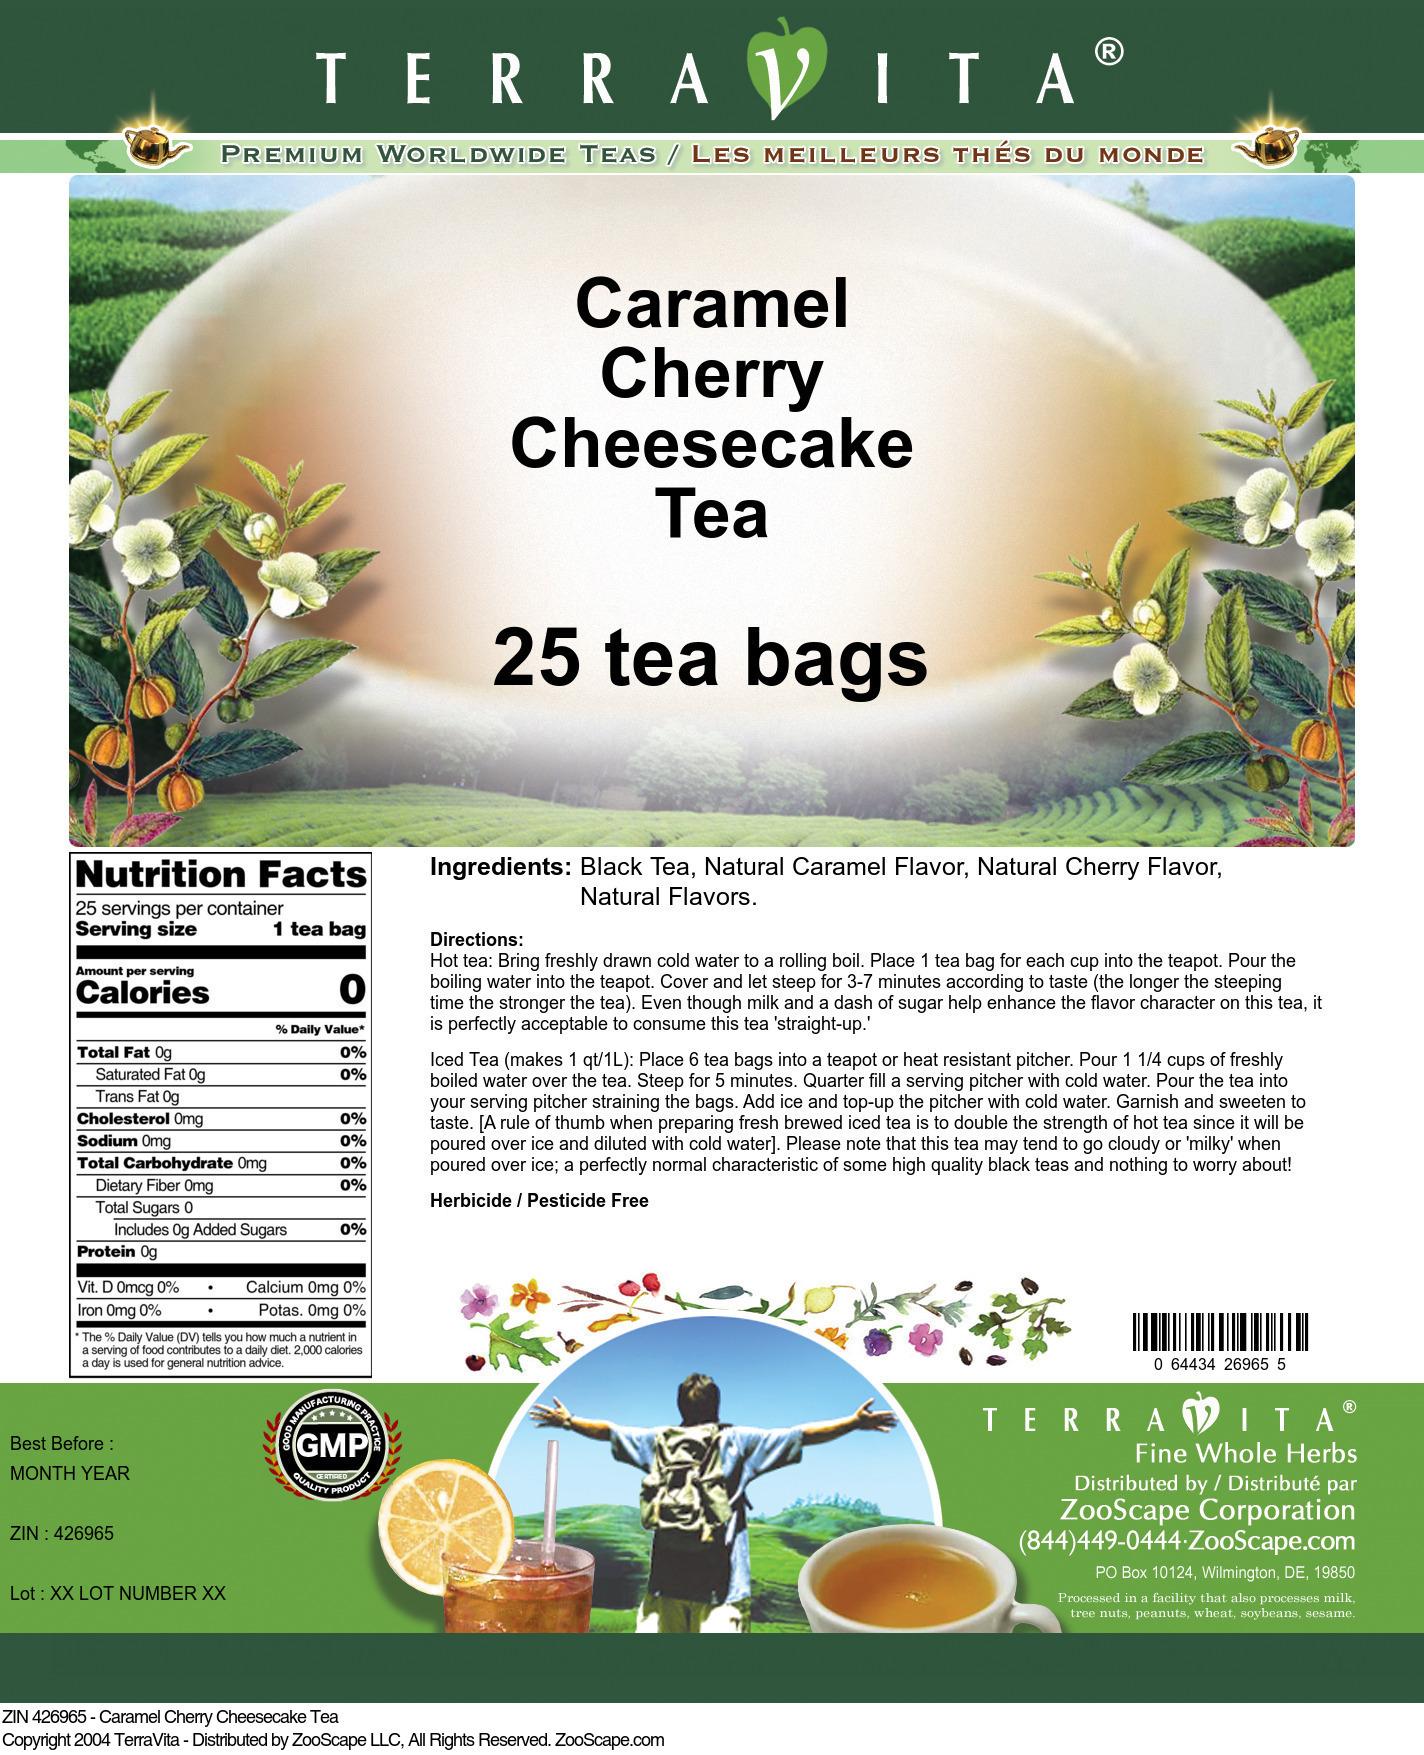 Caramel Cherry Cheesecake Tea